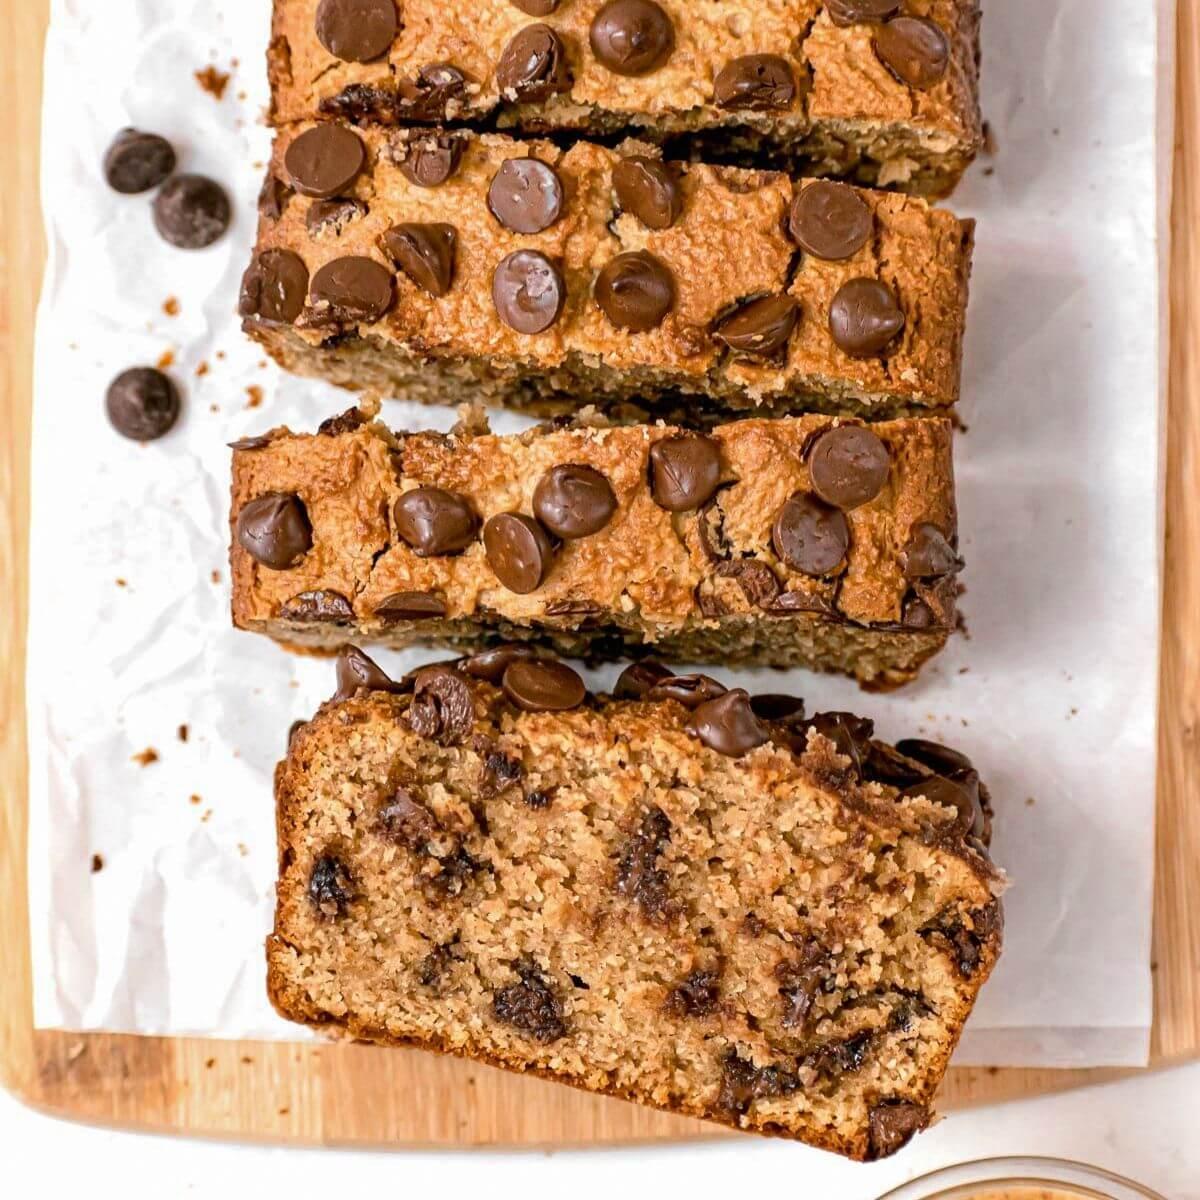 keto healthy almond flour peanut butter bread